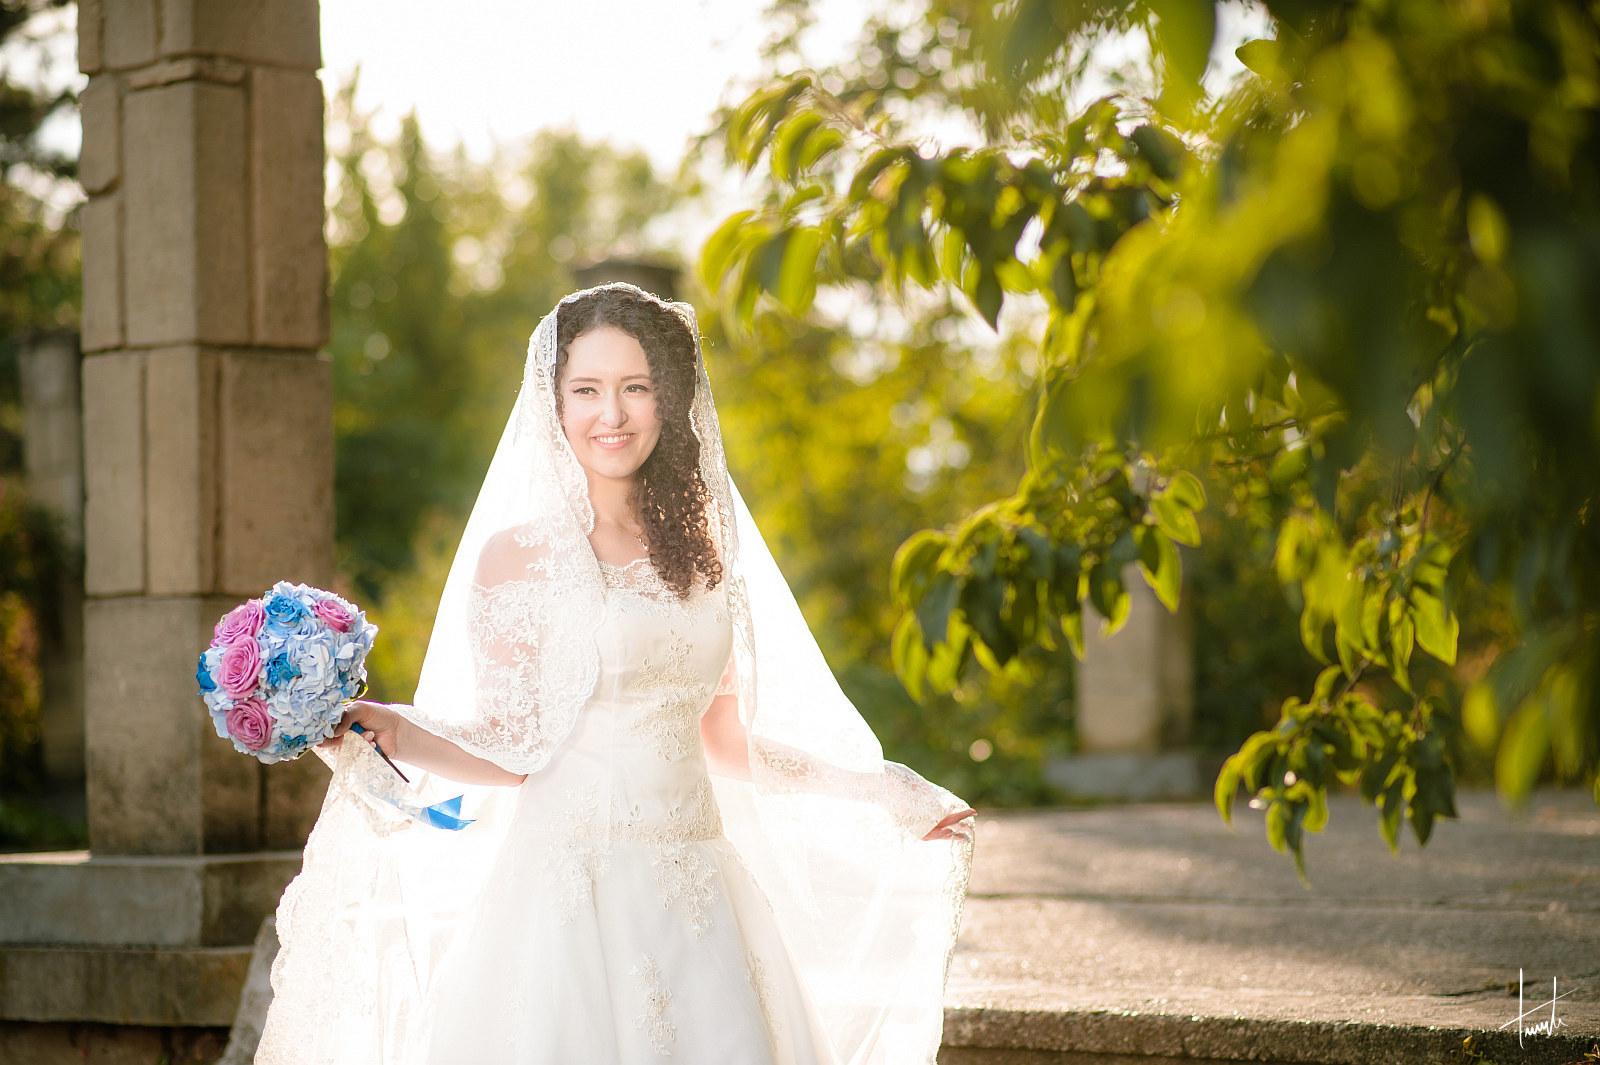 fotografie de nunta - Martha Ionut 12